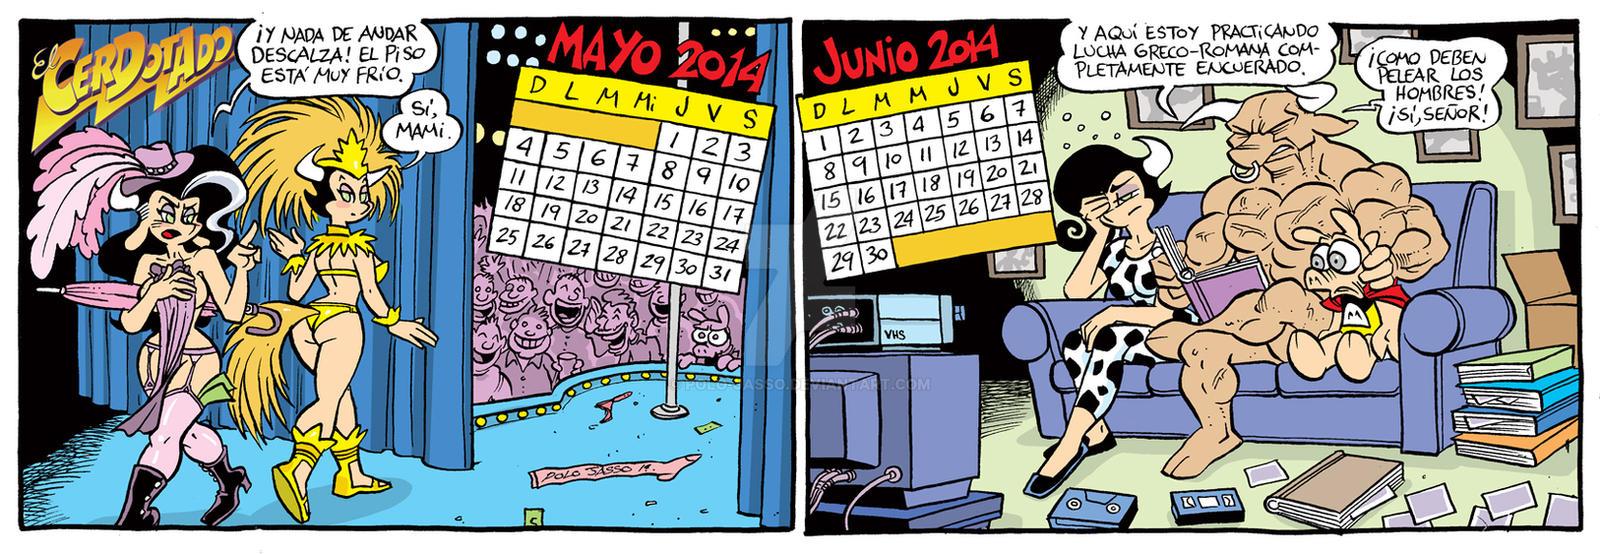 Calendario 2014 Mayo-Junio by POLO-JASSO